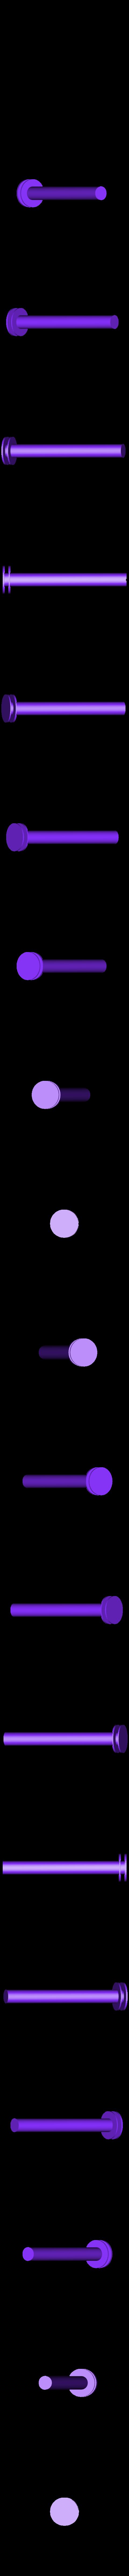 G vérin AR.STL Download STL file Draisine Matisa for LGB • 3D printable object, biddle